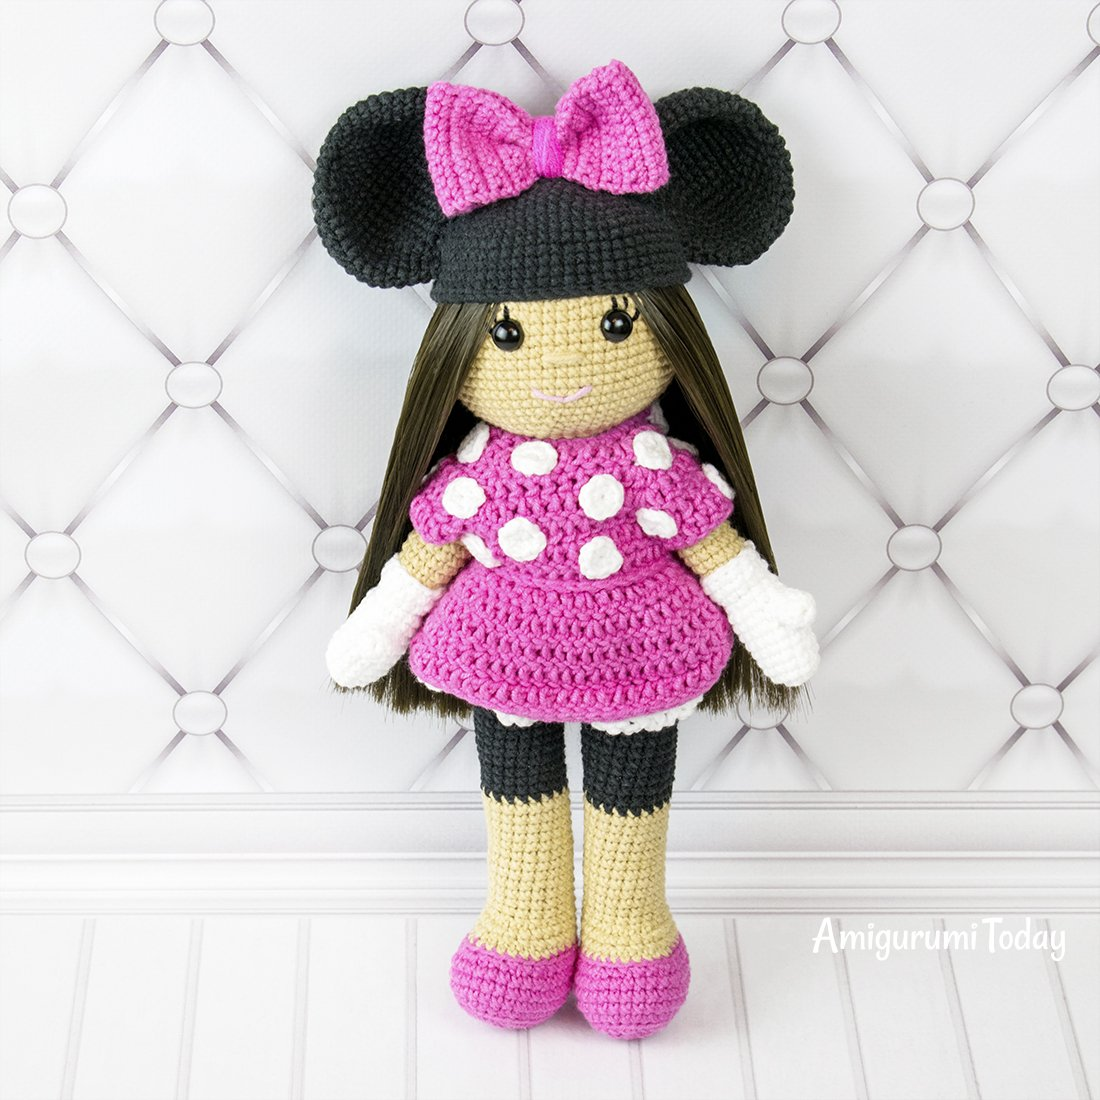 Amigurumi Today Crochet Patterns | Oster häkelanleitungen ... | 1100x1100